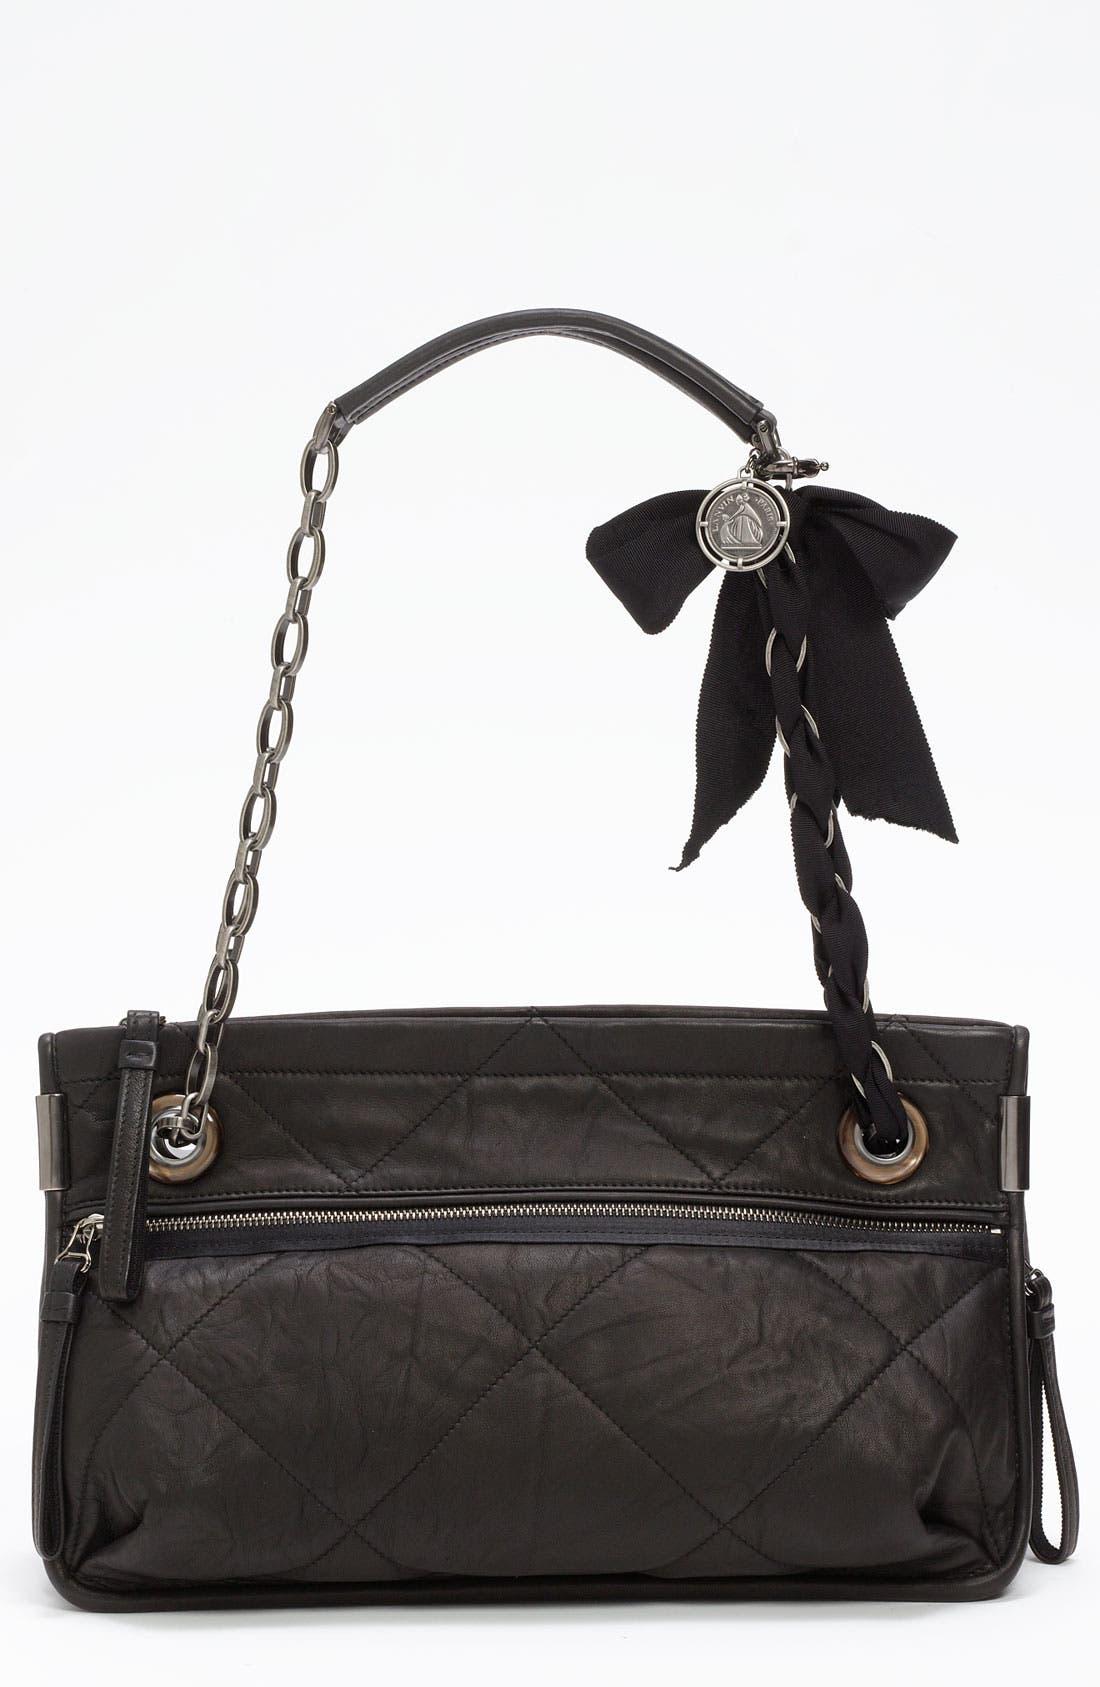 LANVIN, 'Amalia - Medium' Leather Shoulder Bag, Main thumbnail 1, color, 001